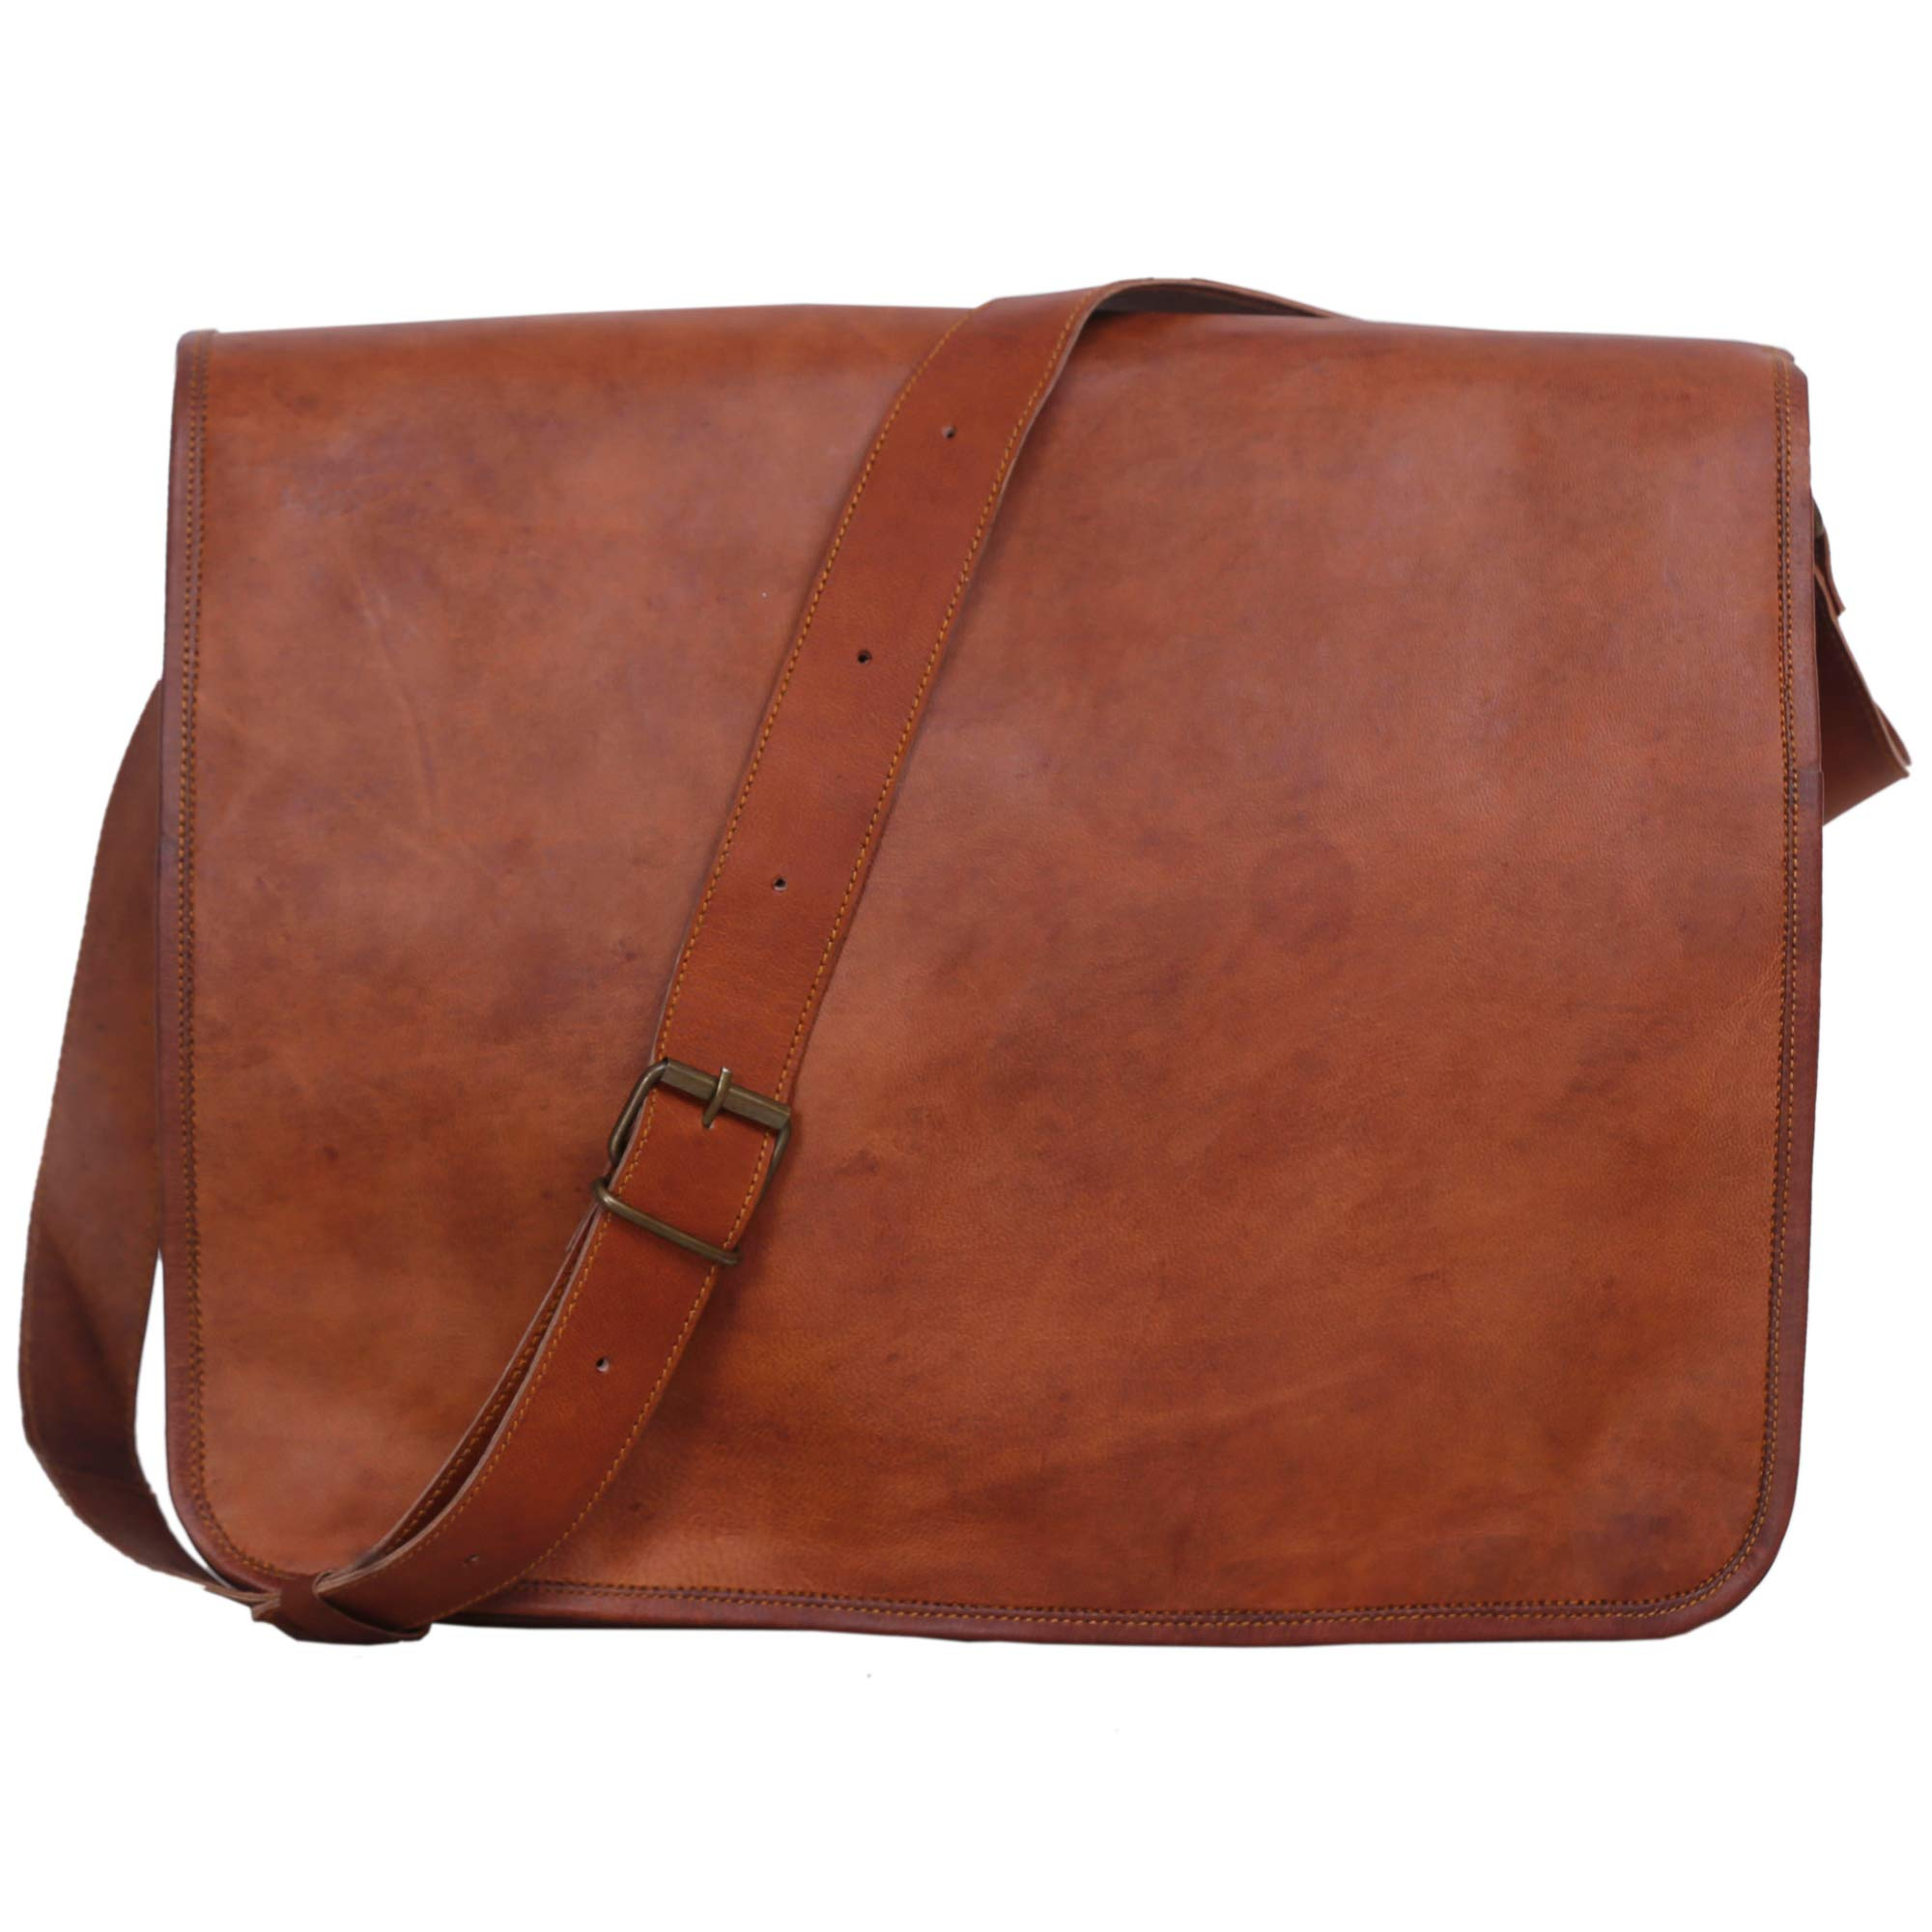 Komal's Passion Leather Vintage Mens 16 Inch Leather Laptop Messenger Pro Satchel Men's Bag by Komal's Passion Leather